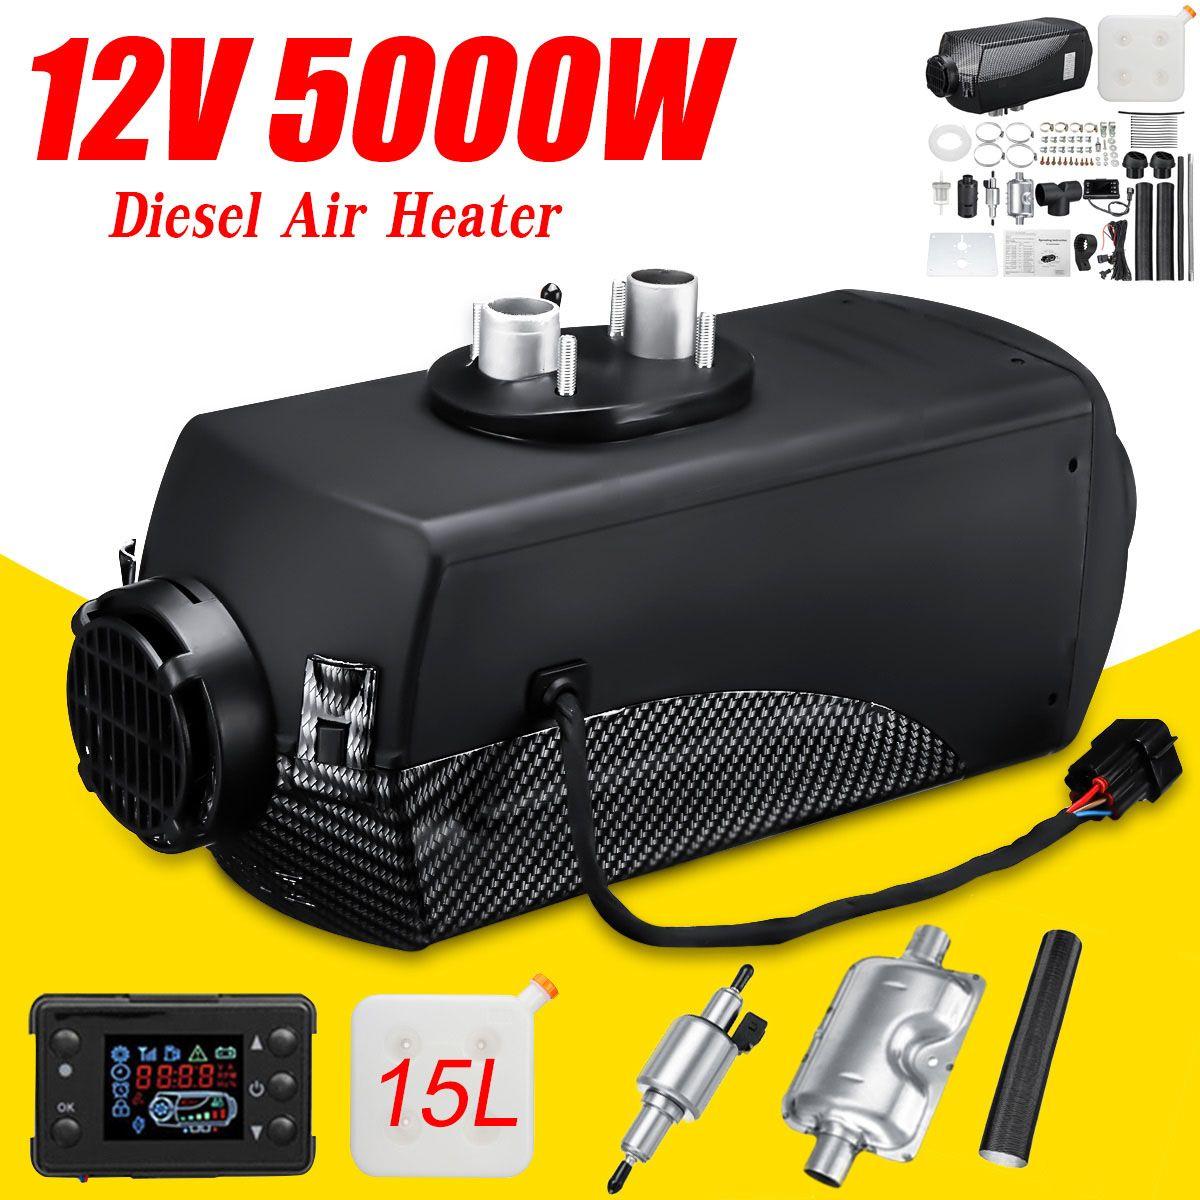 Car Heater 12V 5KW Auto Air Diesels Heater Parking Heater + 15L Tank + LCD Switch for Motorhome Caravan RV Truck Trailer Boat